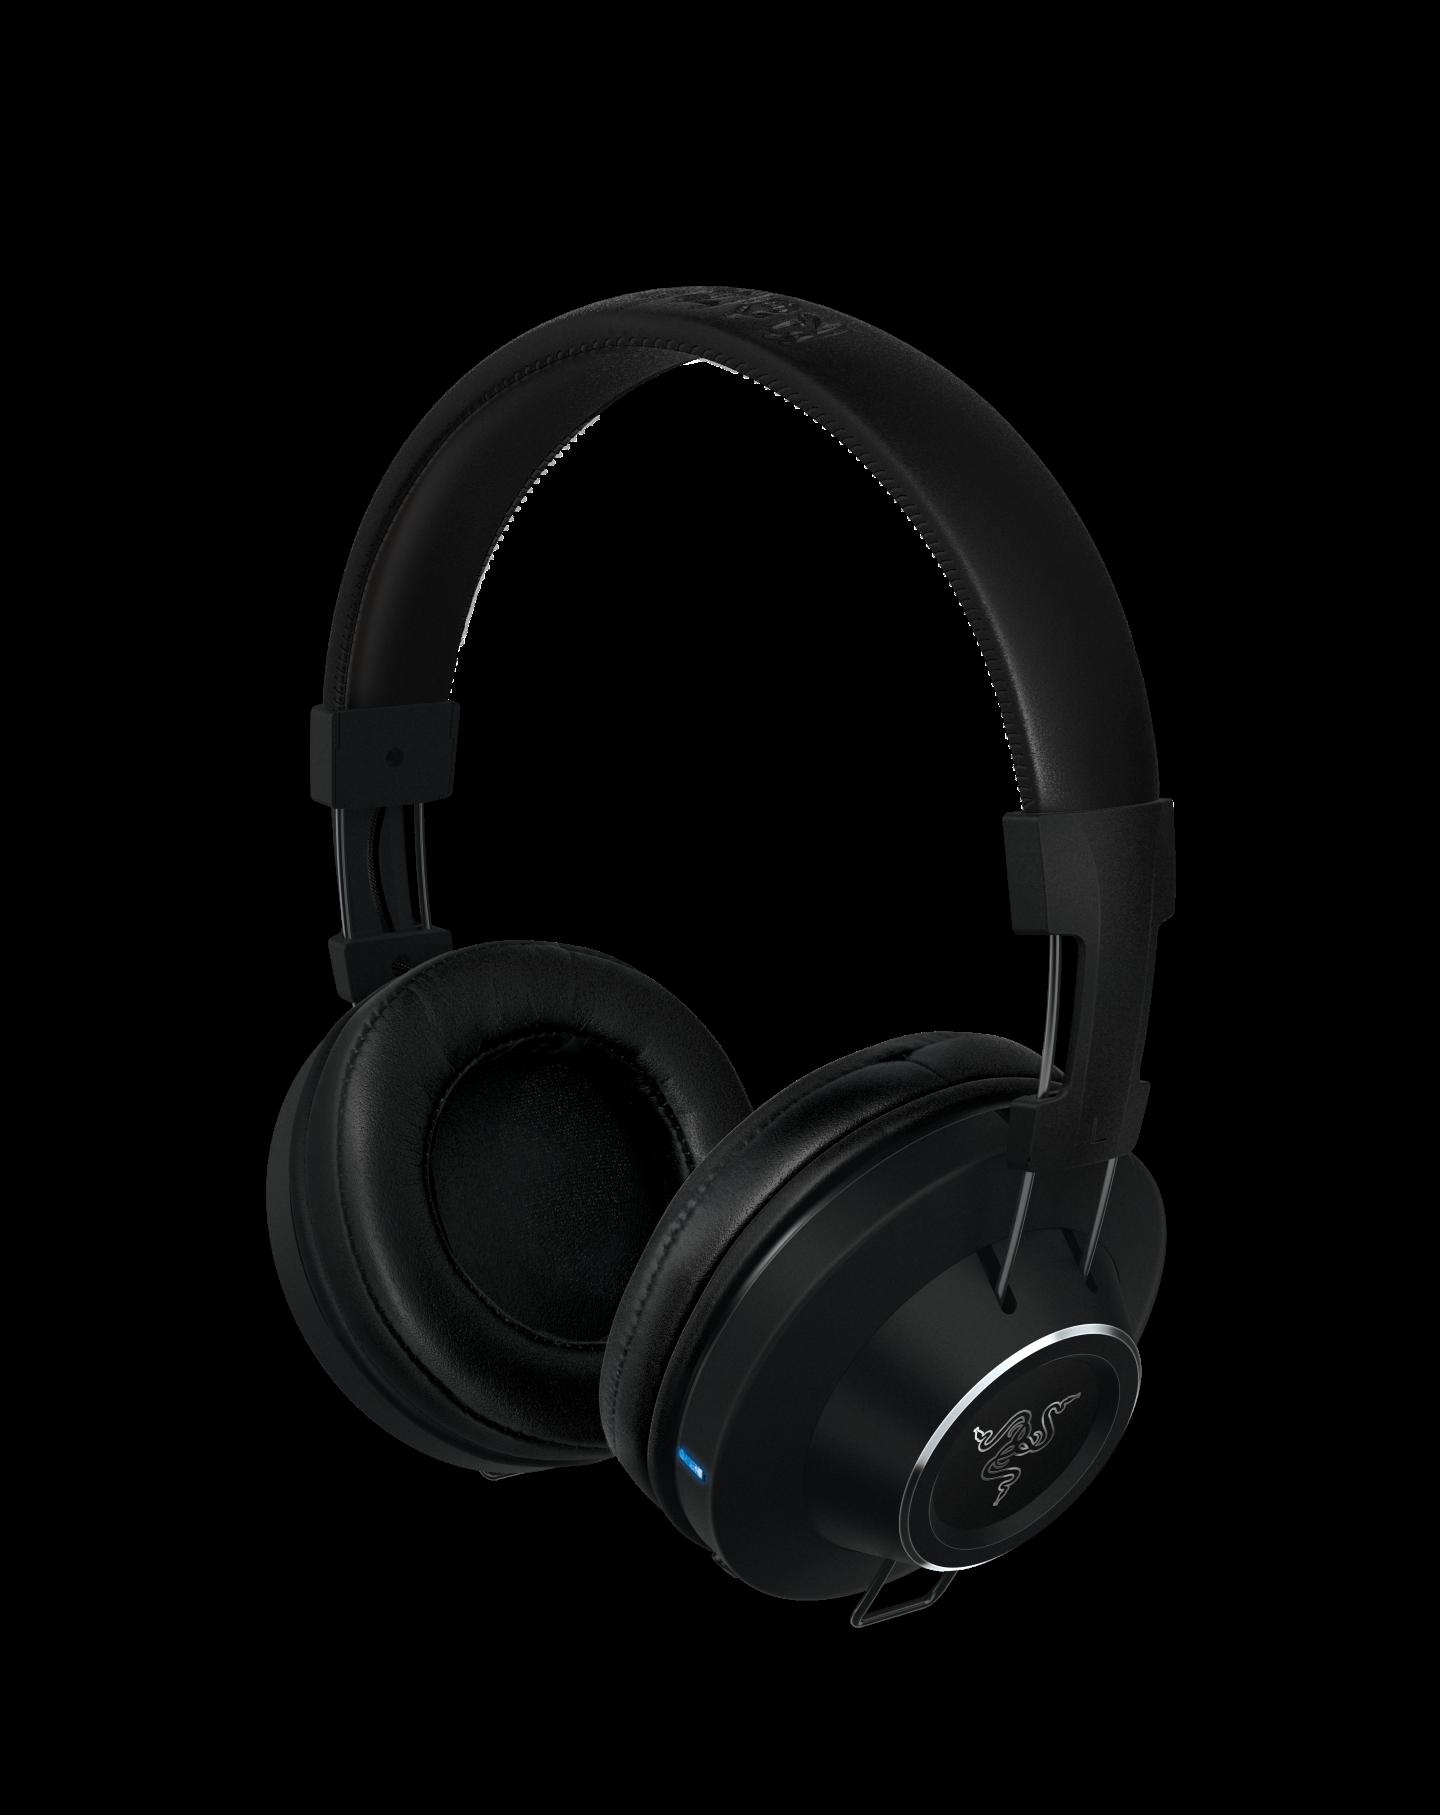 razer adaro headphone series unleashed